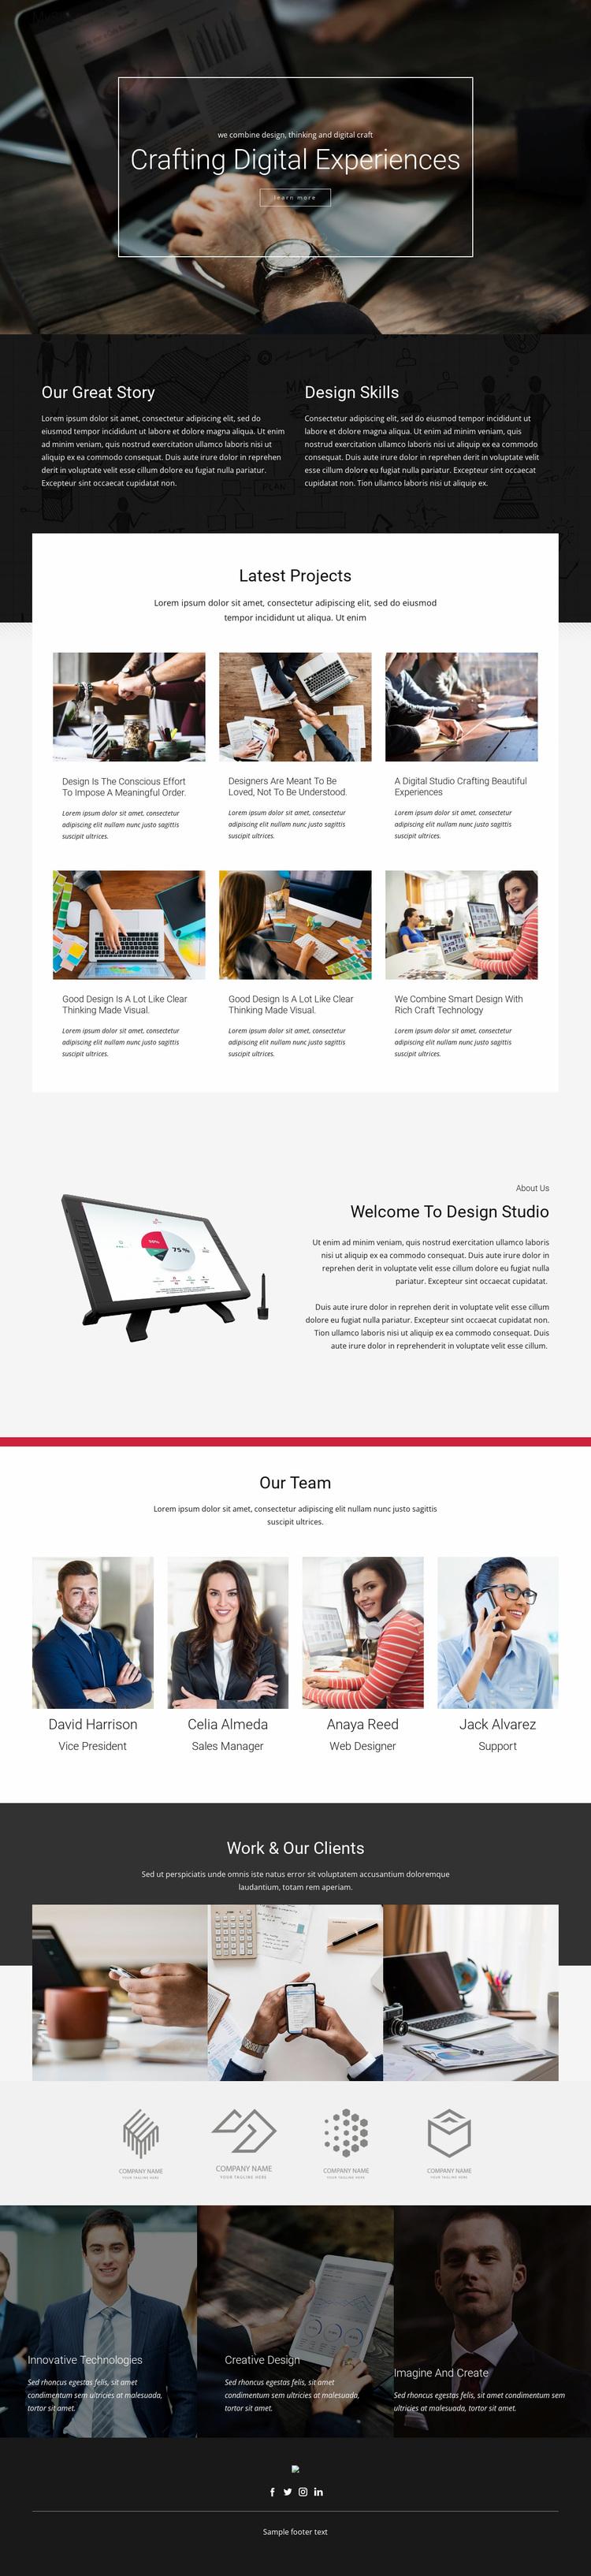 Crafting Digital Design Studio Website Design